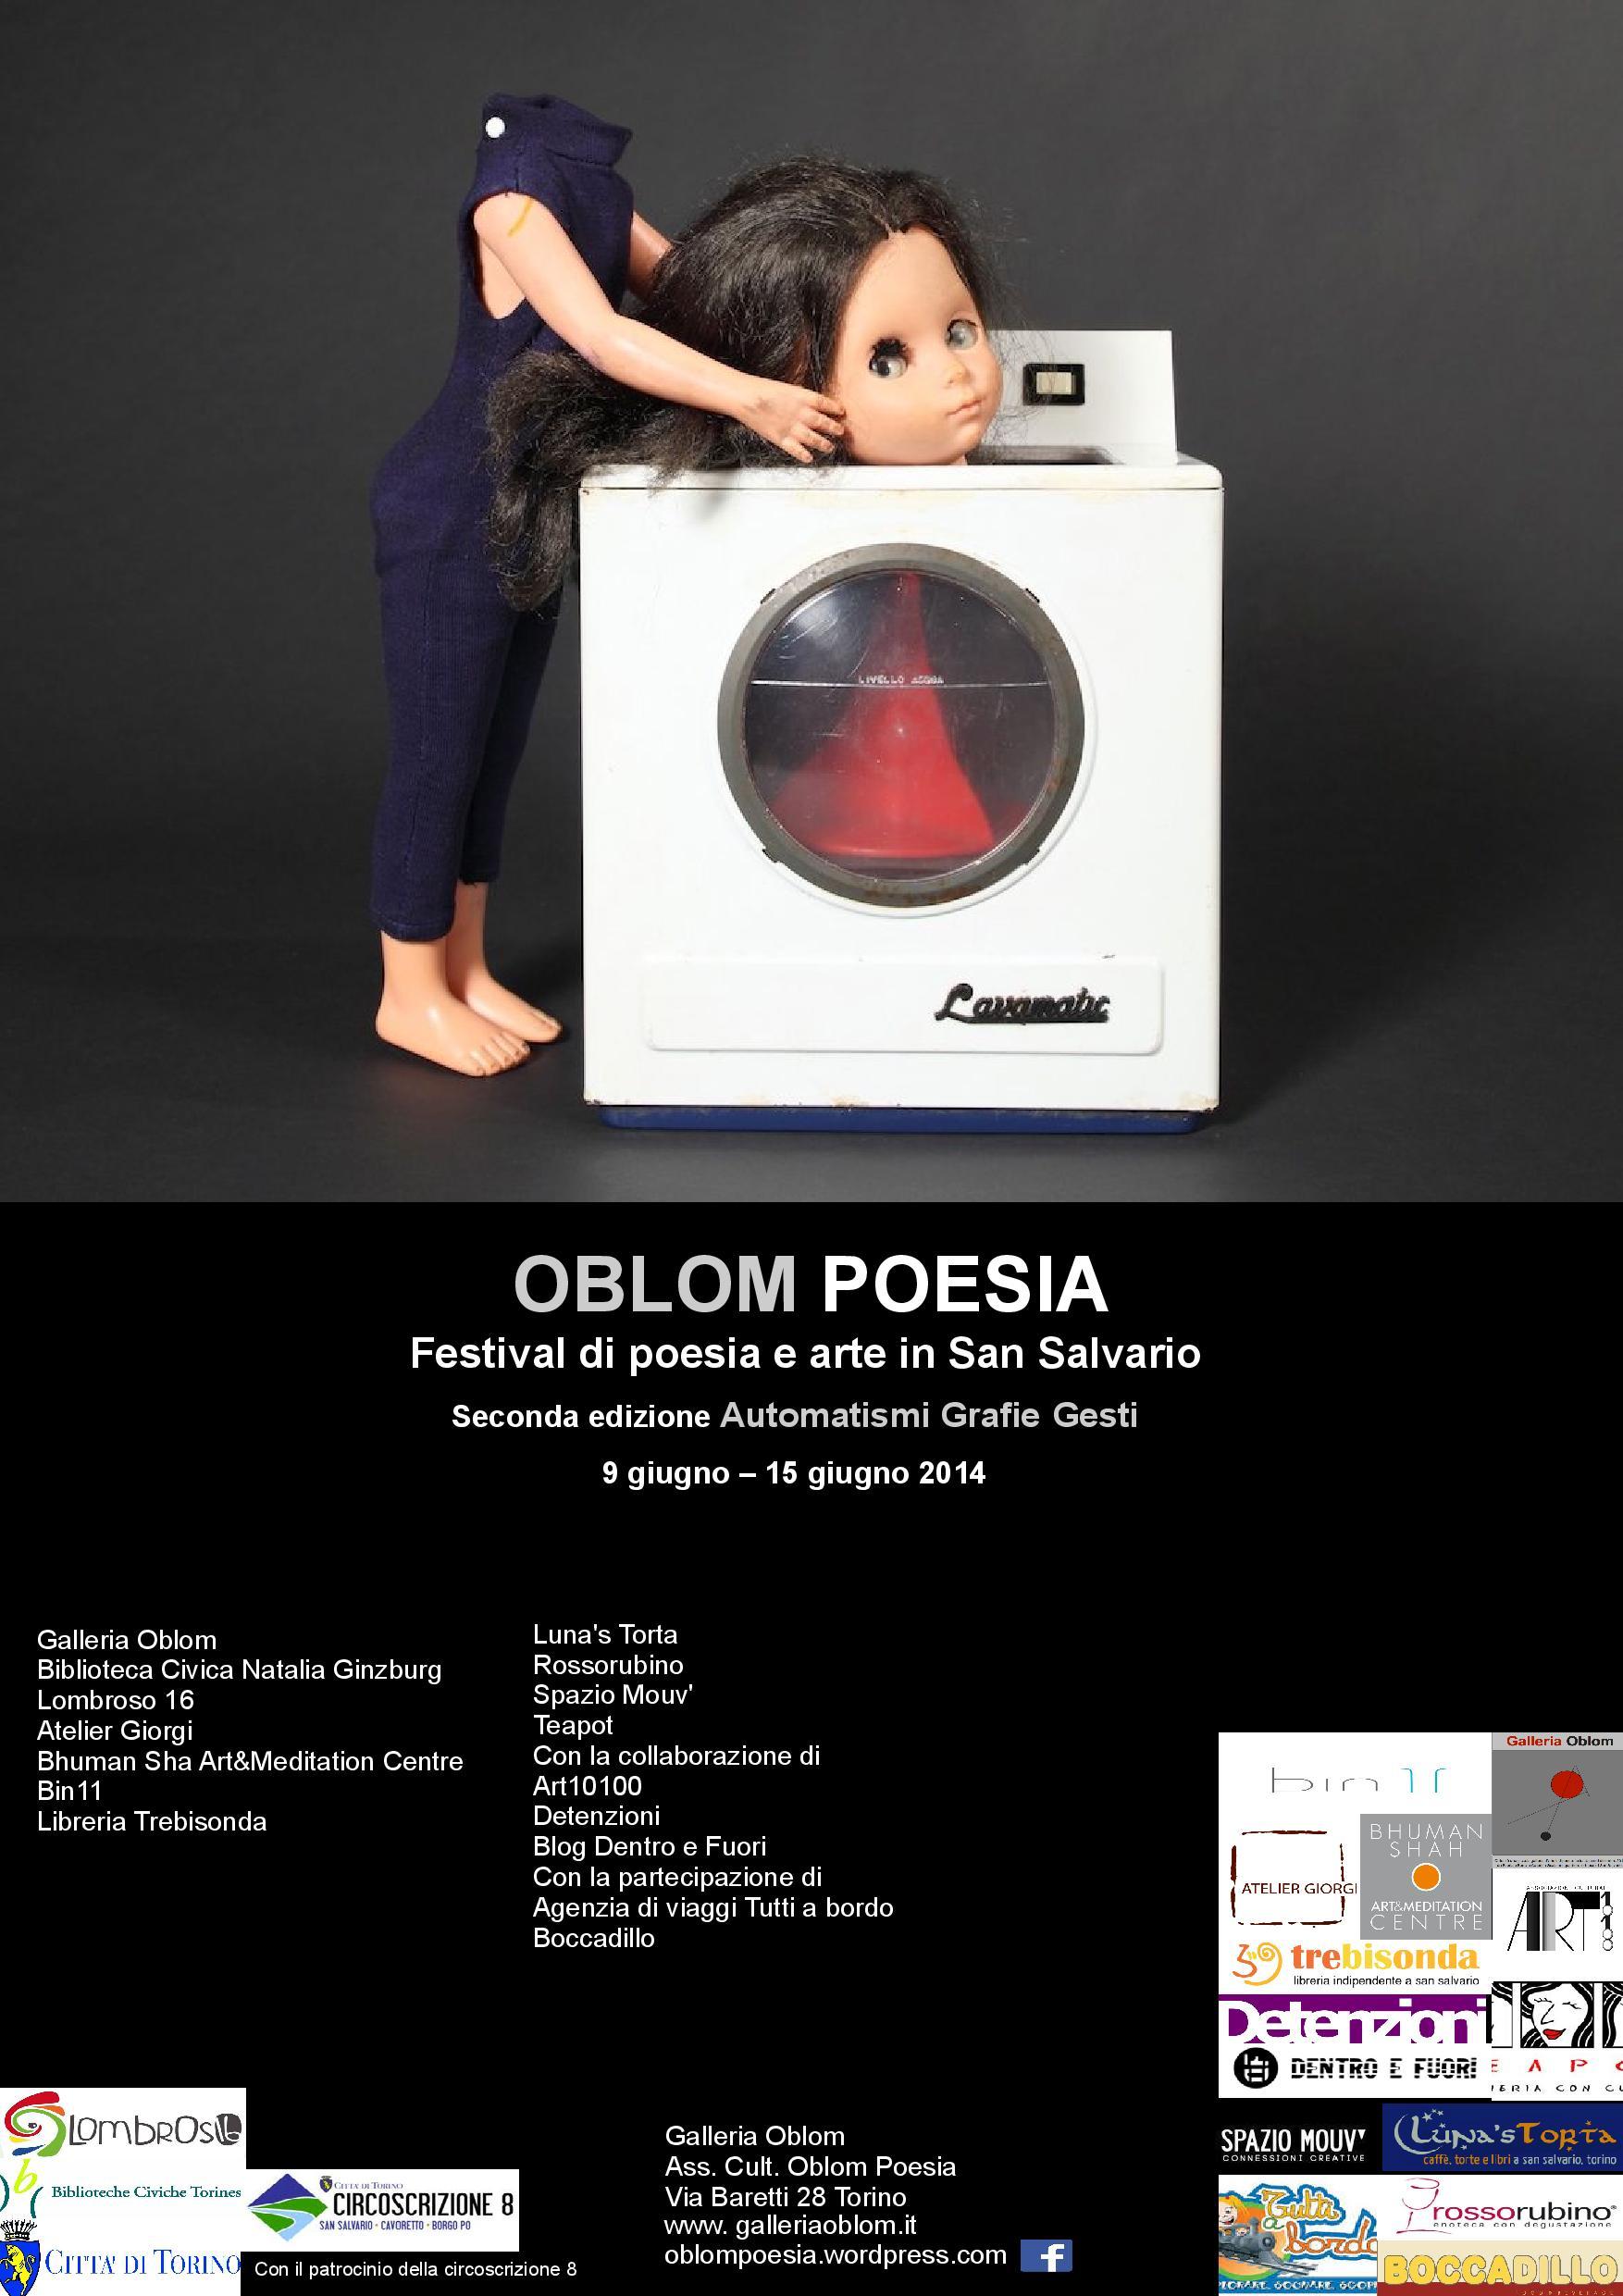 OBLOM Poesia 2014, Immagine di Caterina Scala